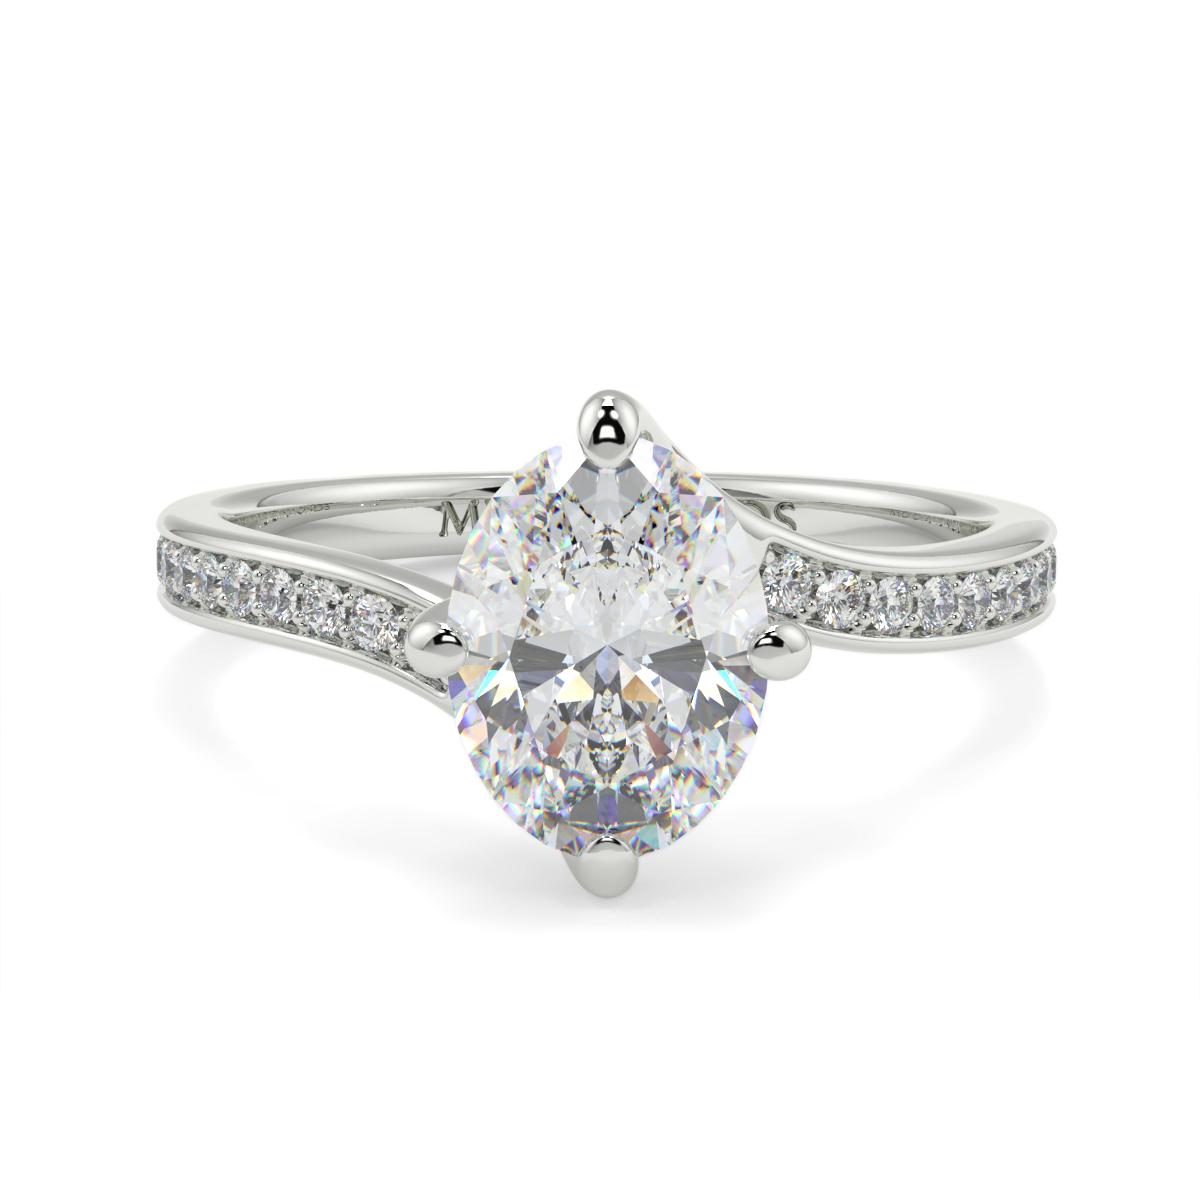 Oval Pave Set Twist Diamond Ring